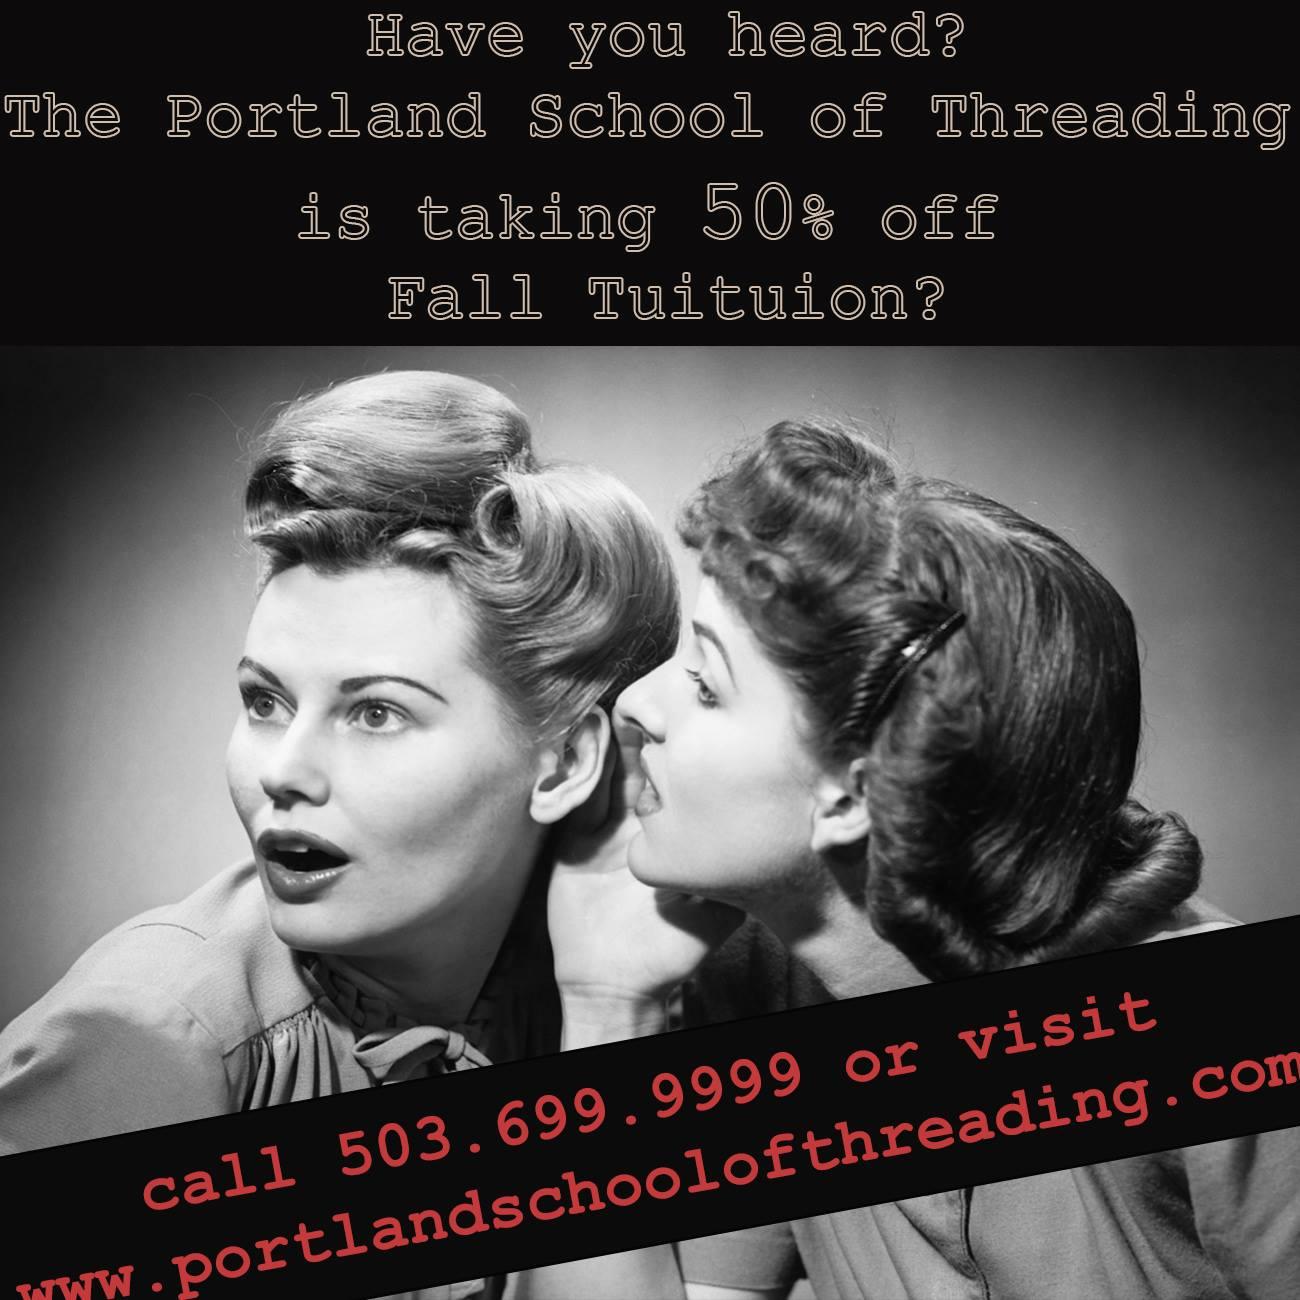 portland school of threading 50% off tuition